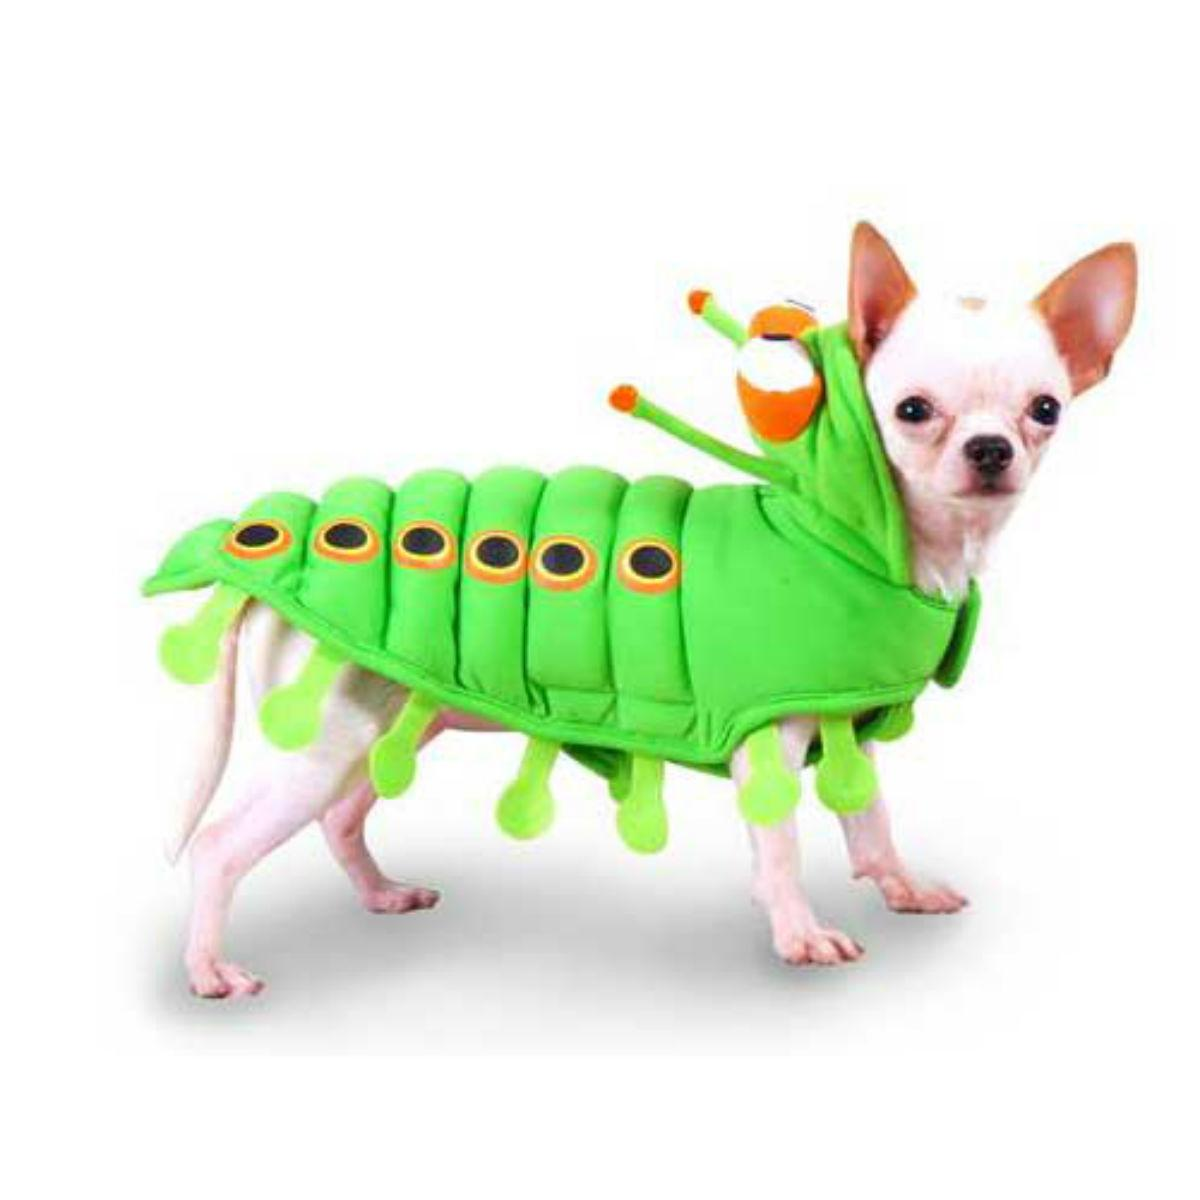 Caterpillar Halloween Dog Costume - Green